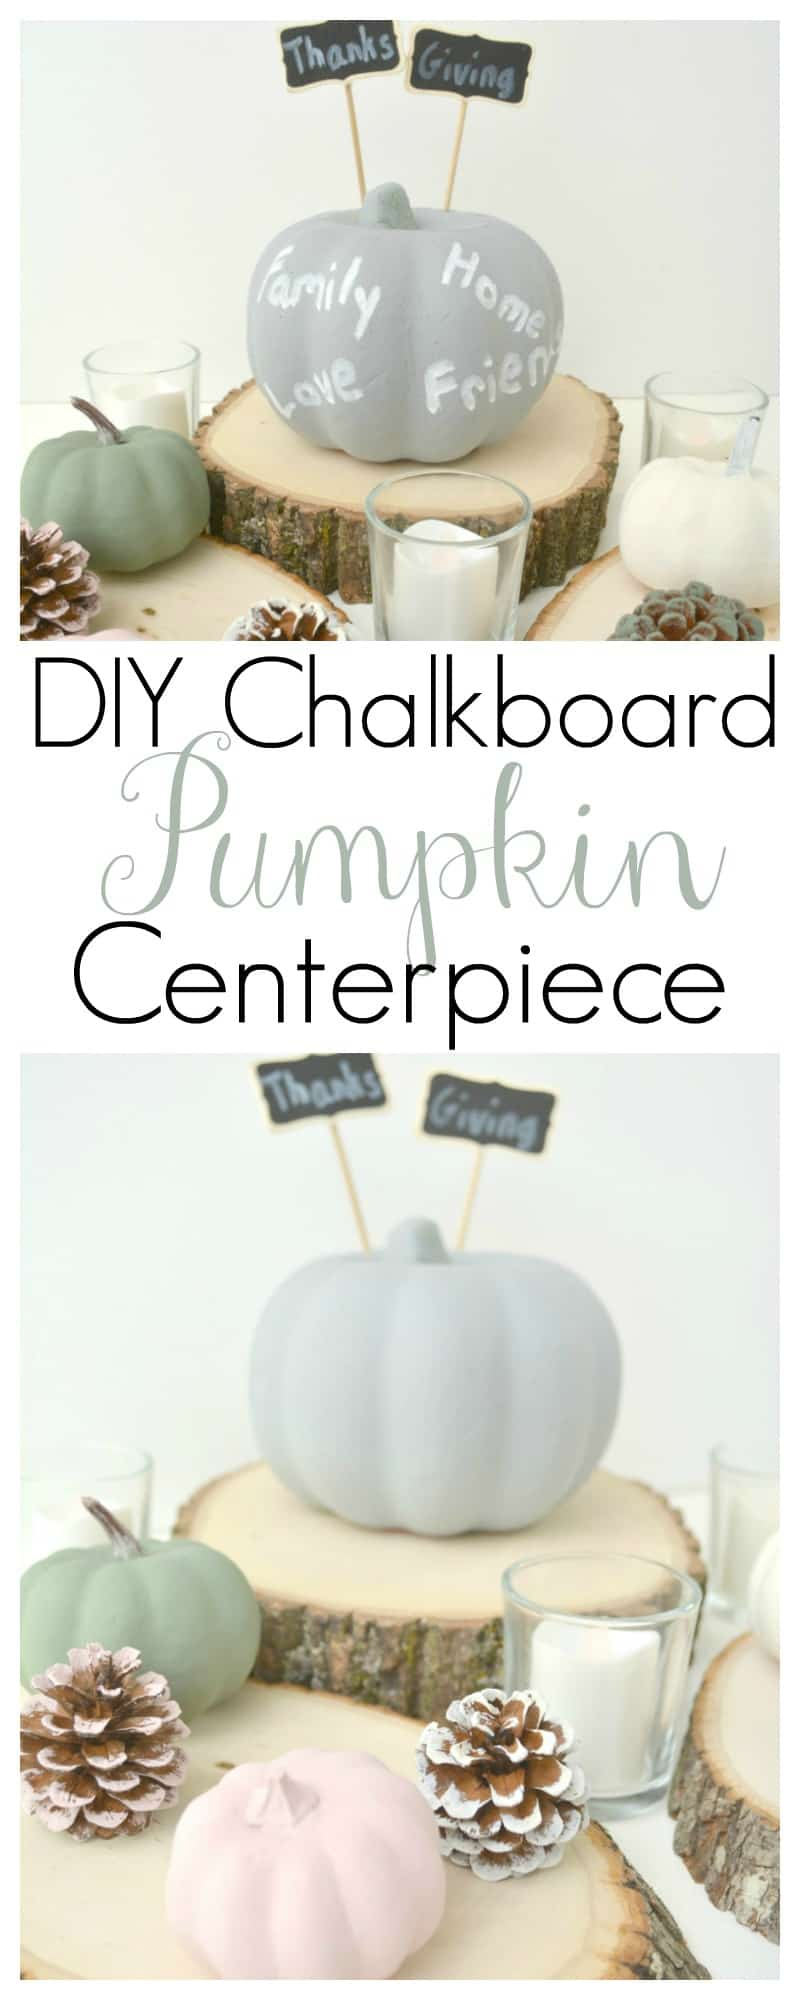 DIY Chalkboard Pumpkin Centerpiece